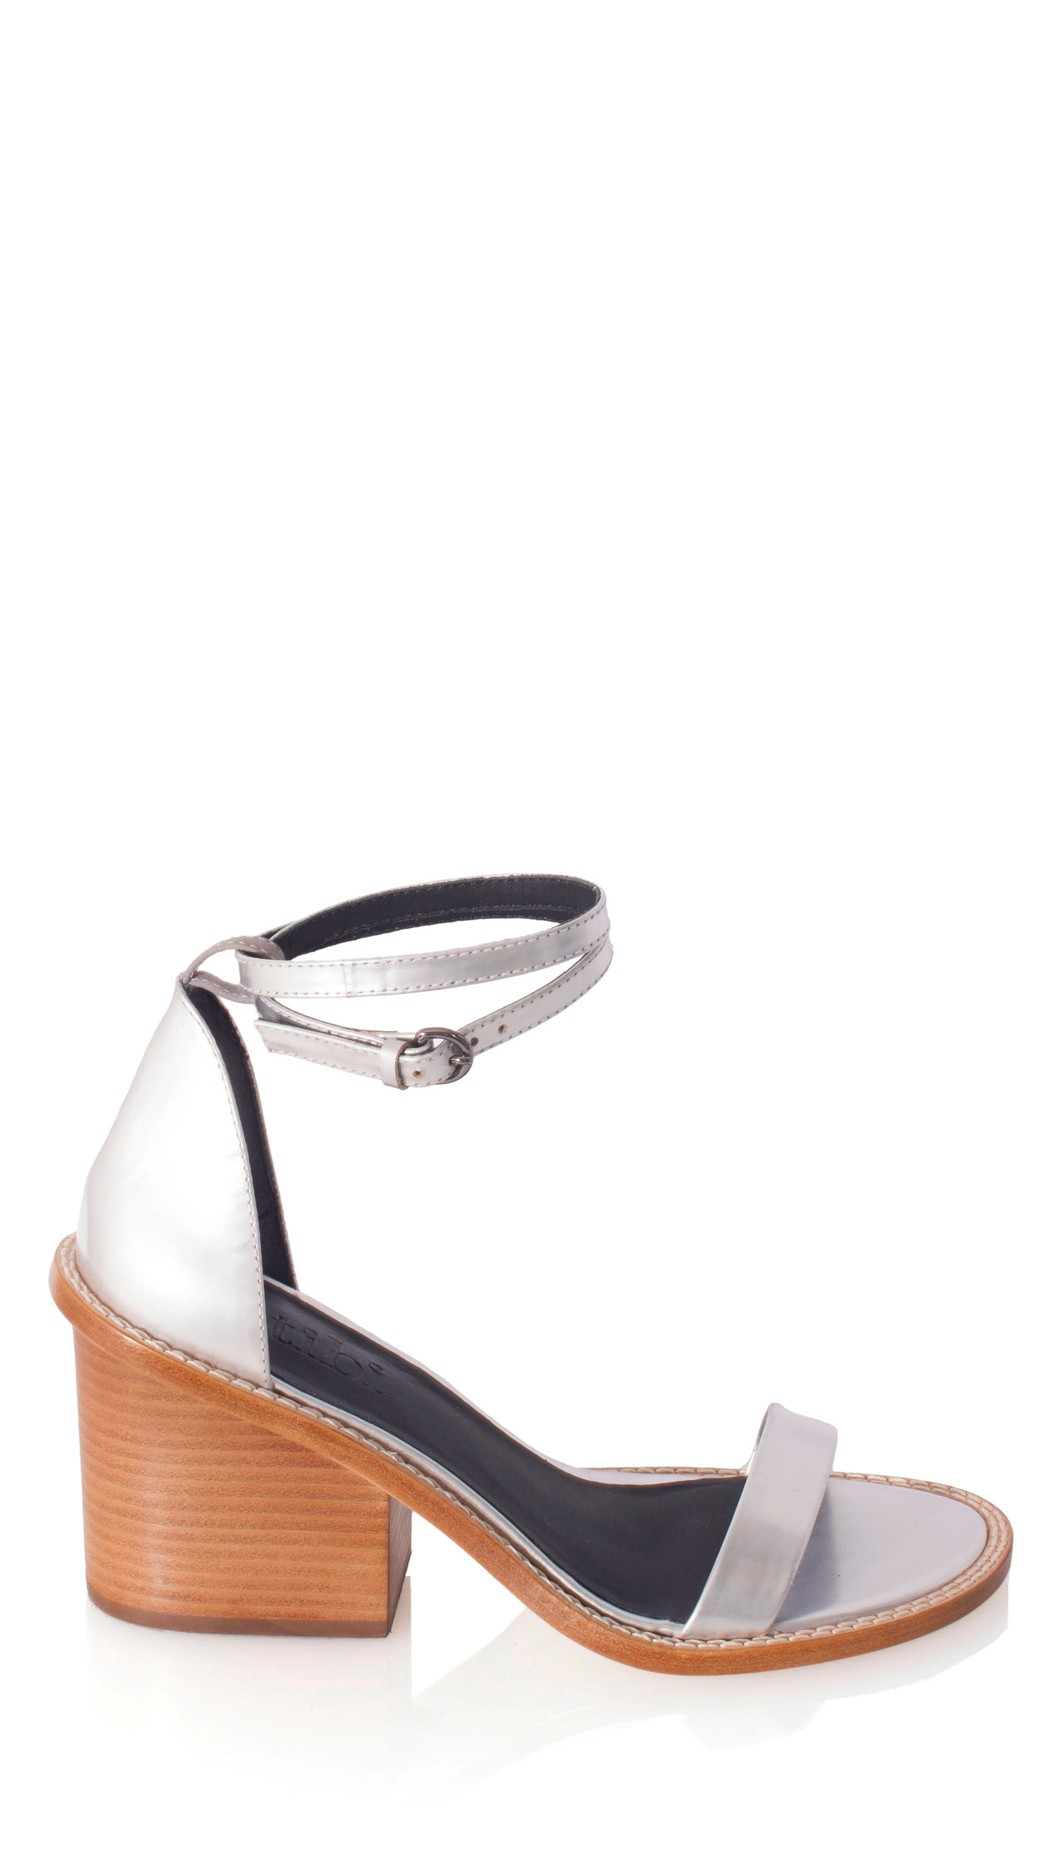 Tibi Metallic Leather Sandals cheap visit new marketable sale online jDXzJXt